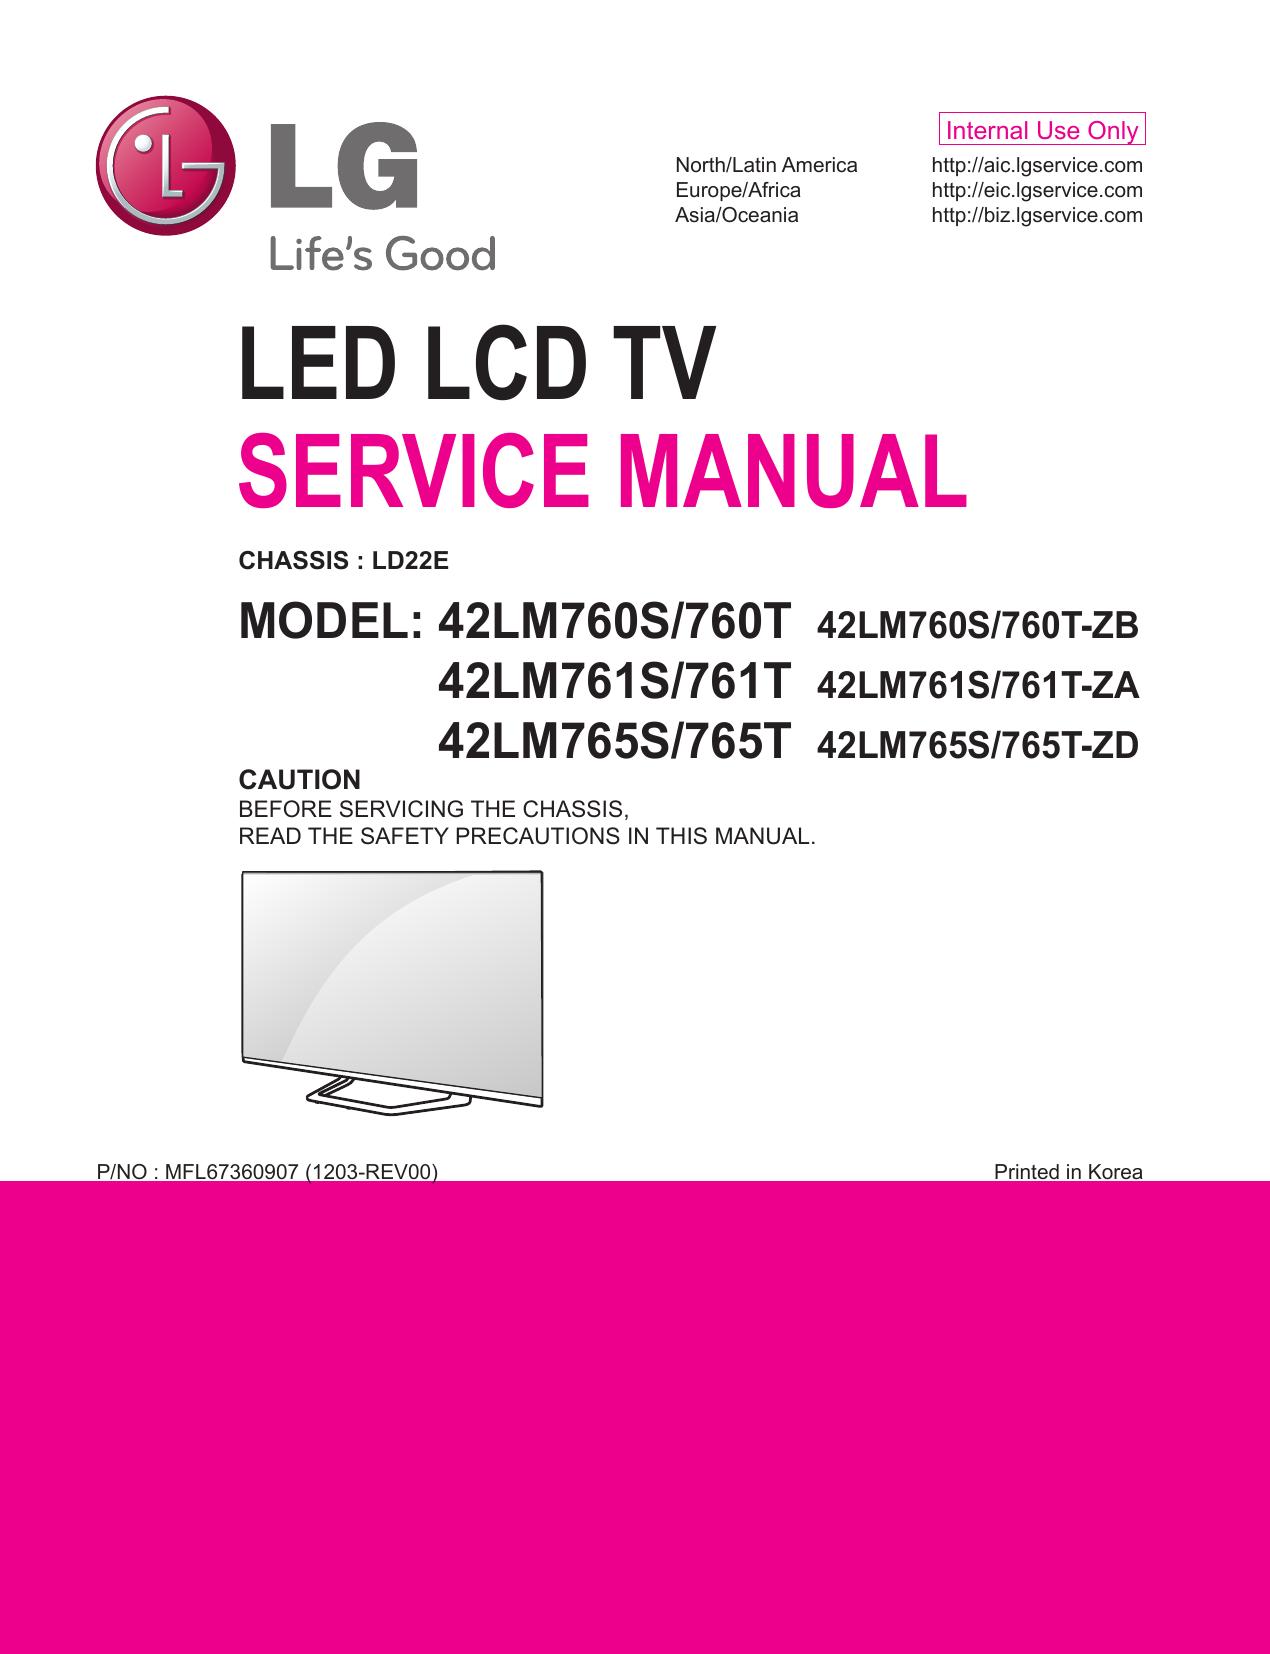 LED LCD TV SERVICE MANUAL | manualzz com